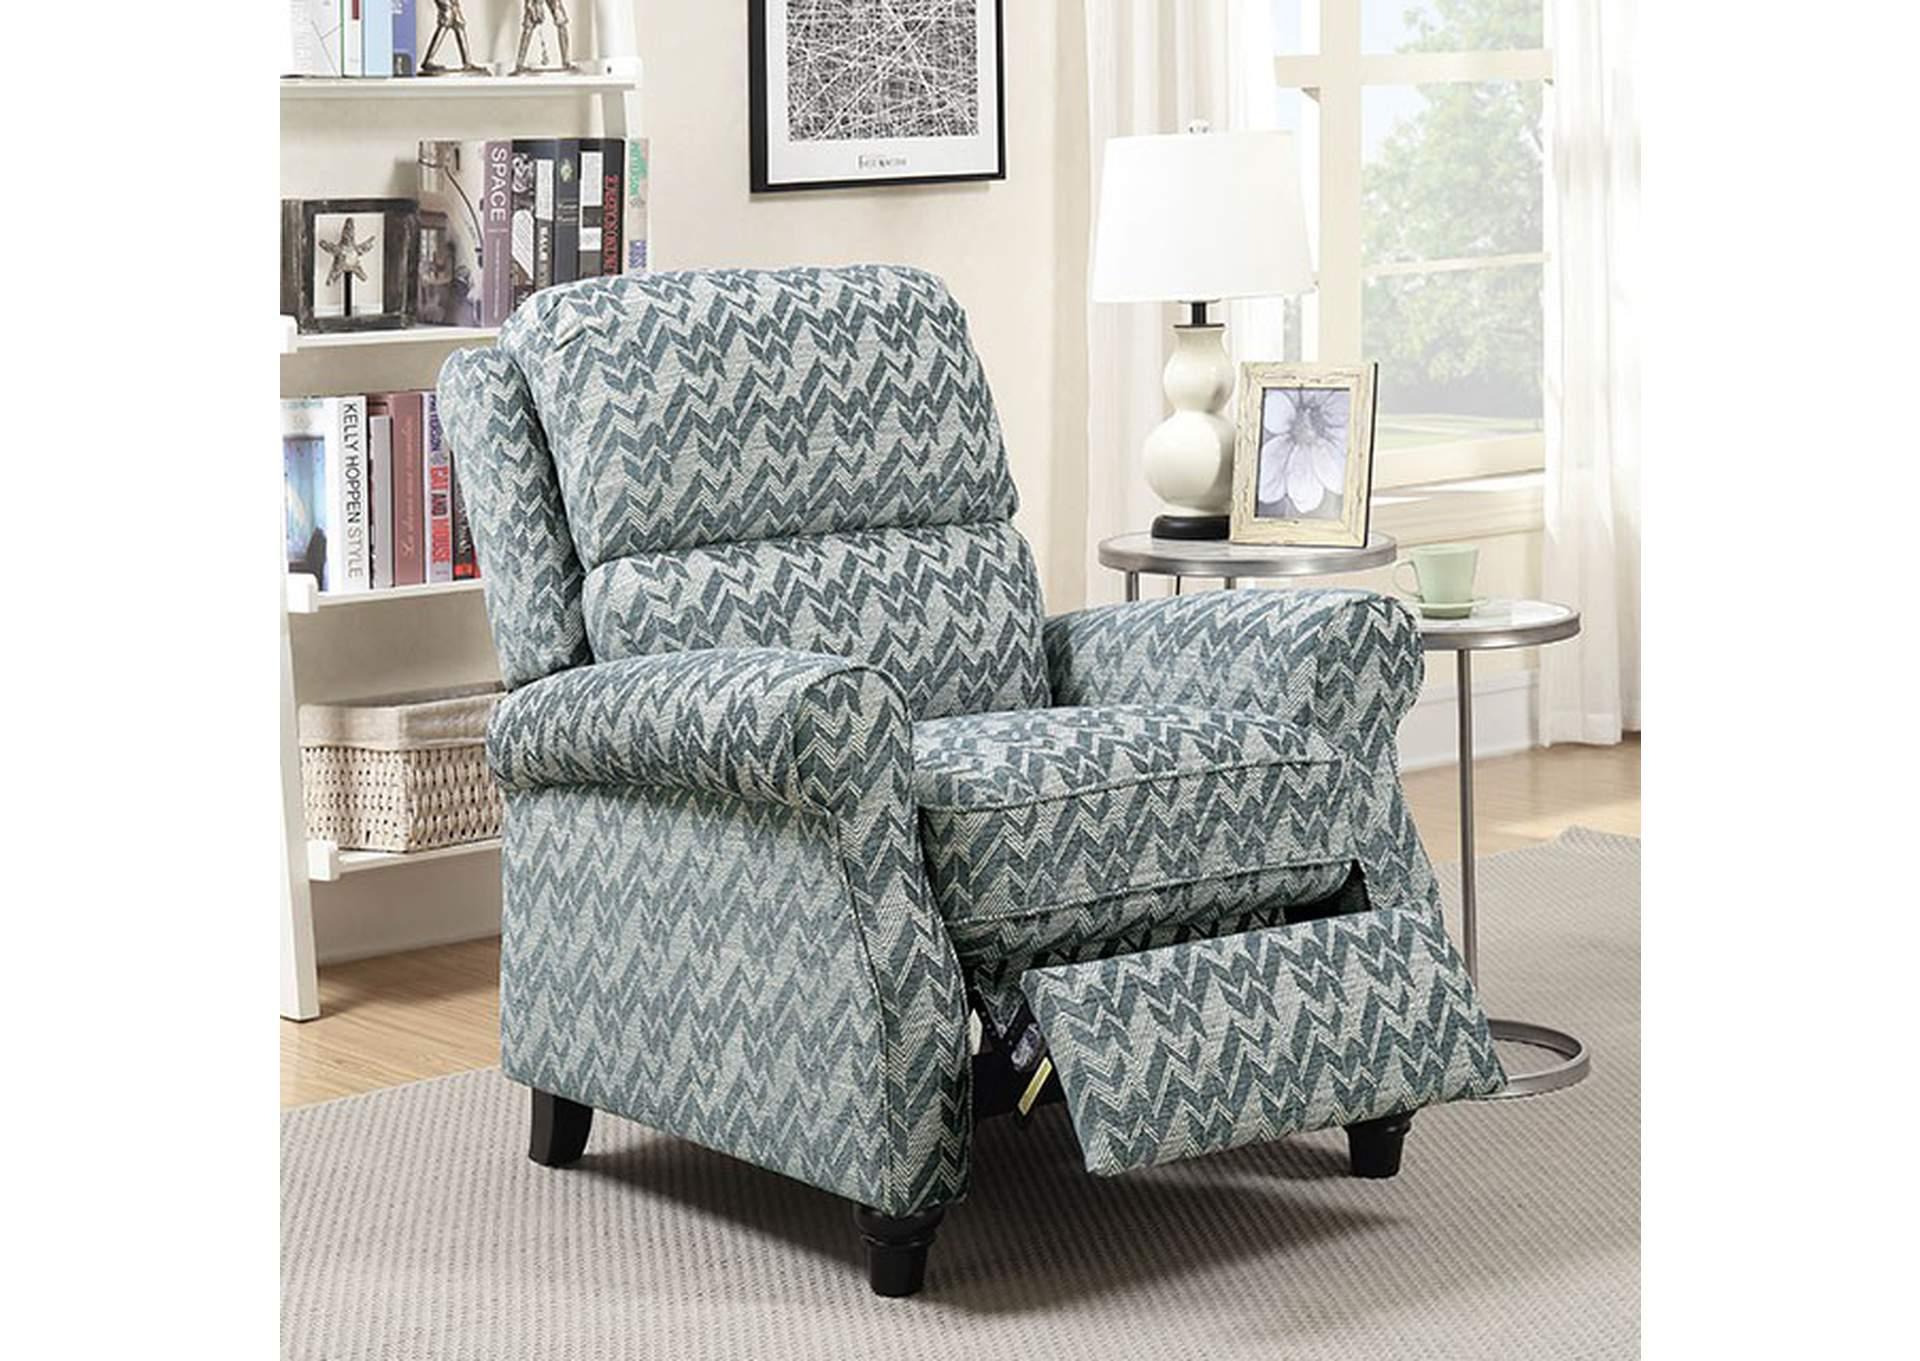 Attirant Amy Push Back Recliner,Furniture Of America